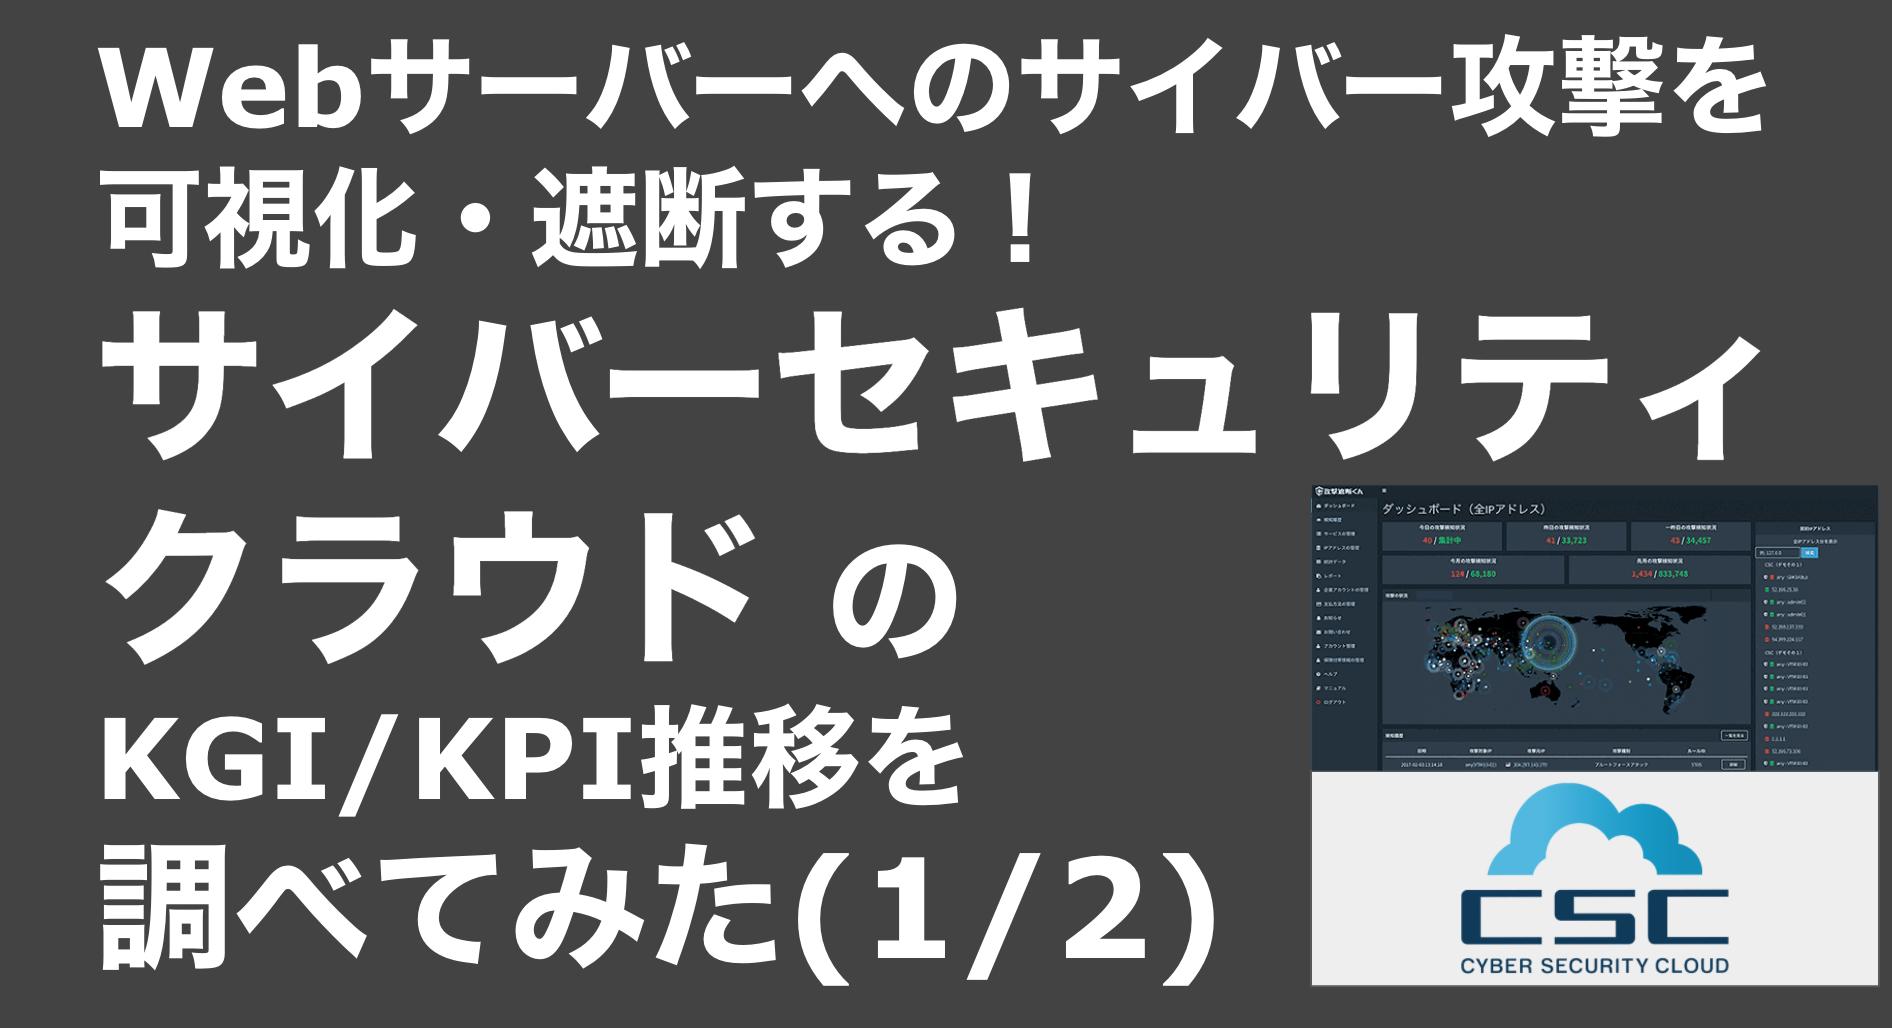 saaslife_Webサーバーへのサイバー攻撃を可視化・遮断する!サイバーセキュリティクラウド のKGI/KPI推移を調べてみた(1/2)